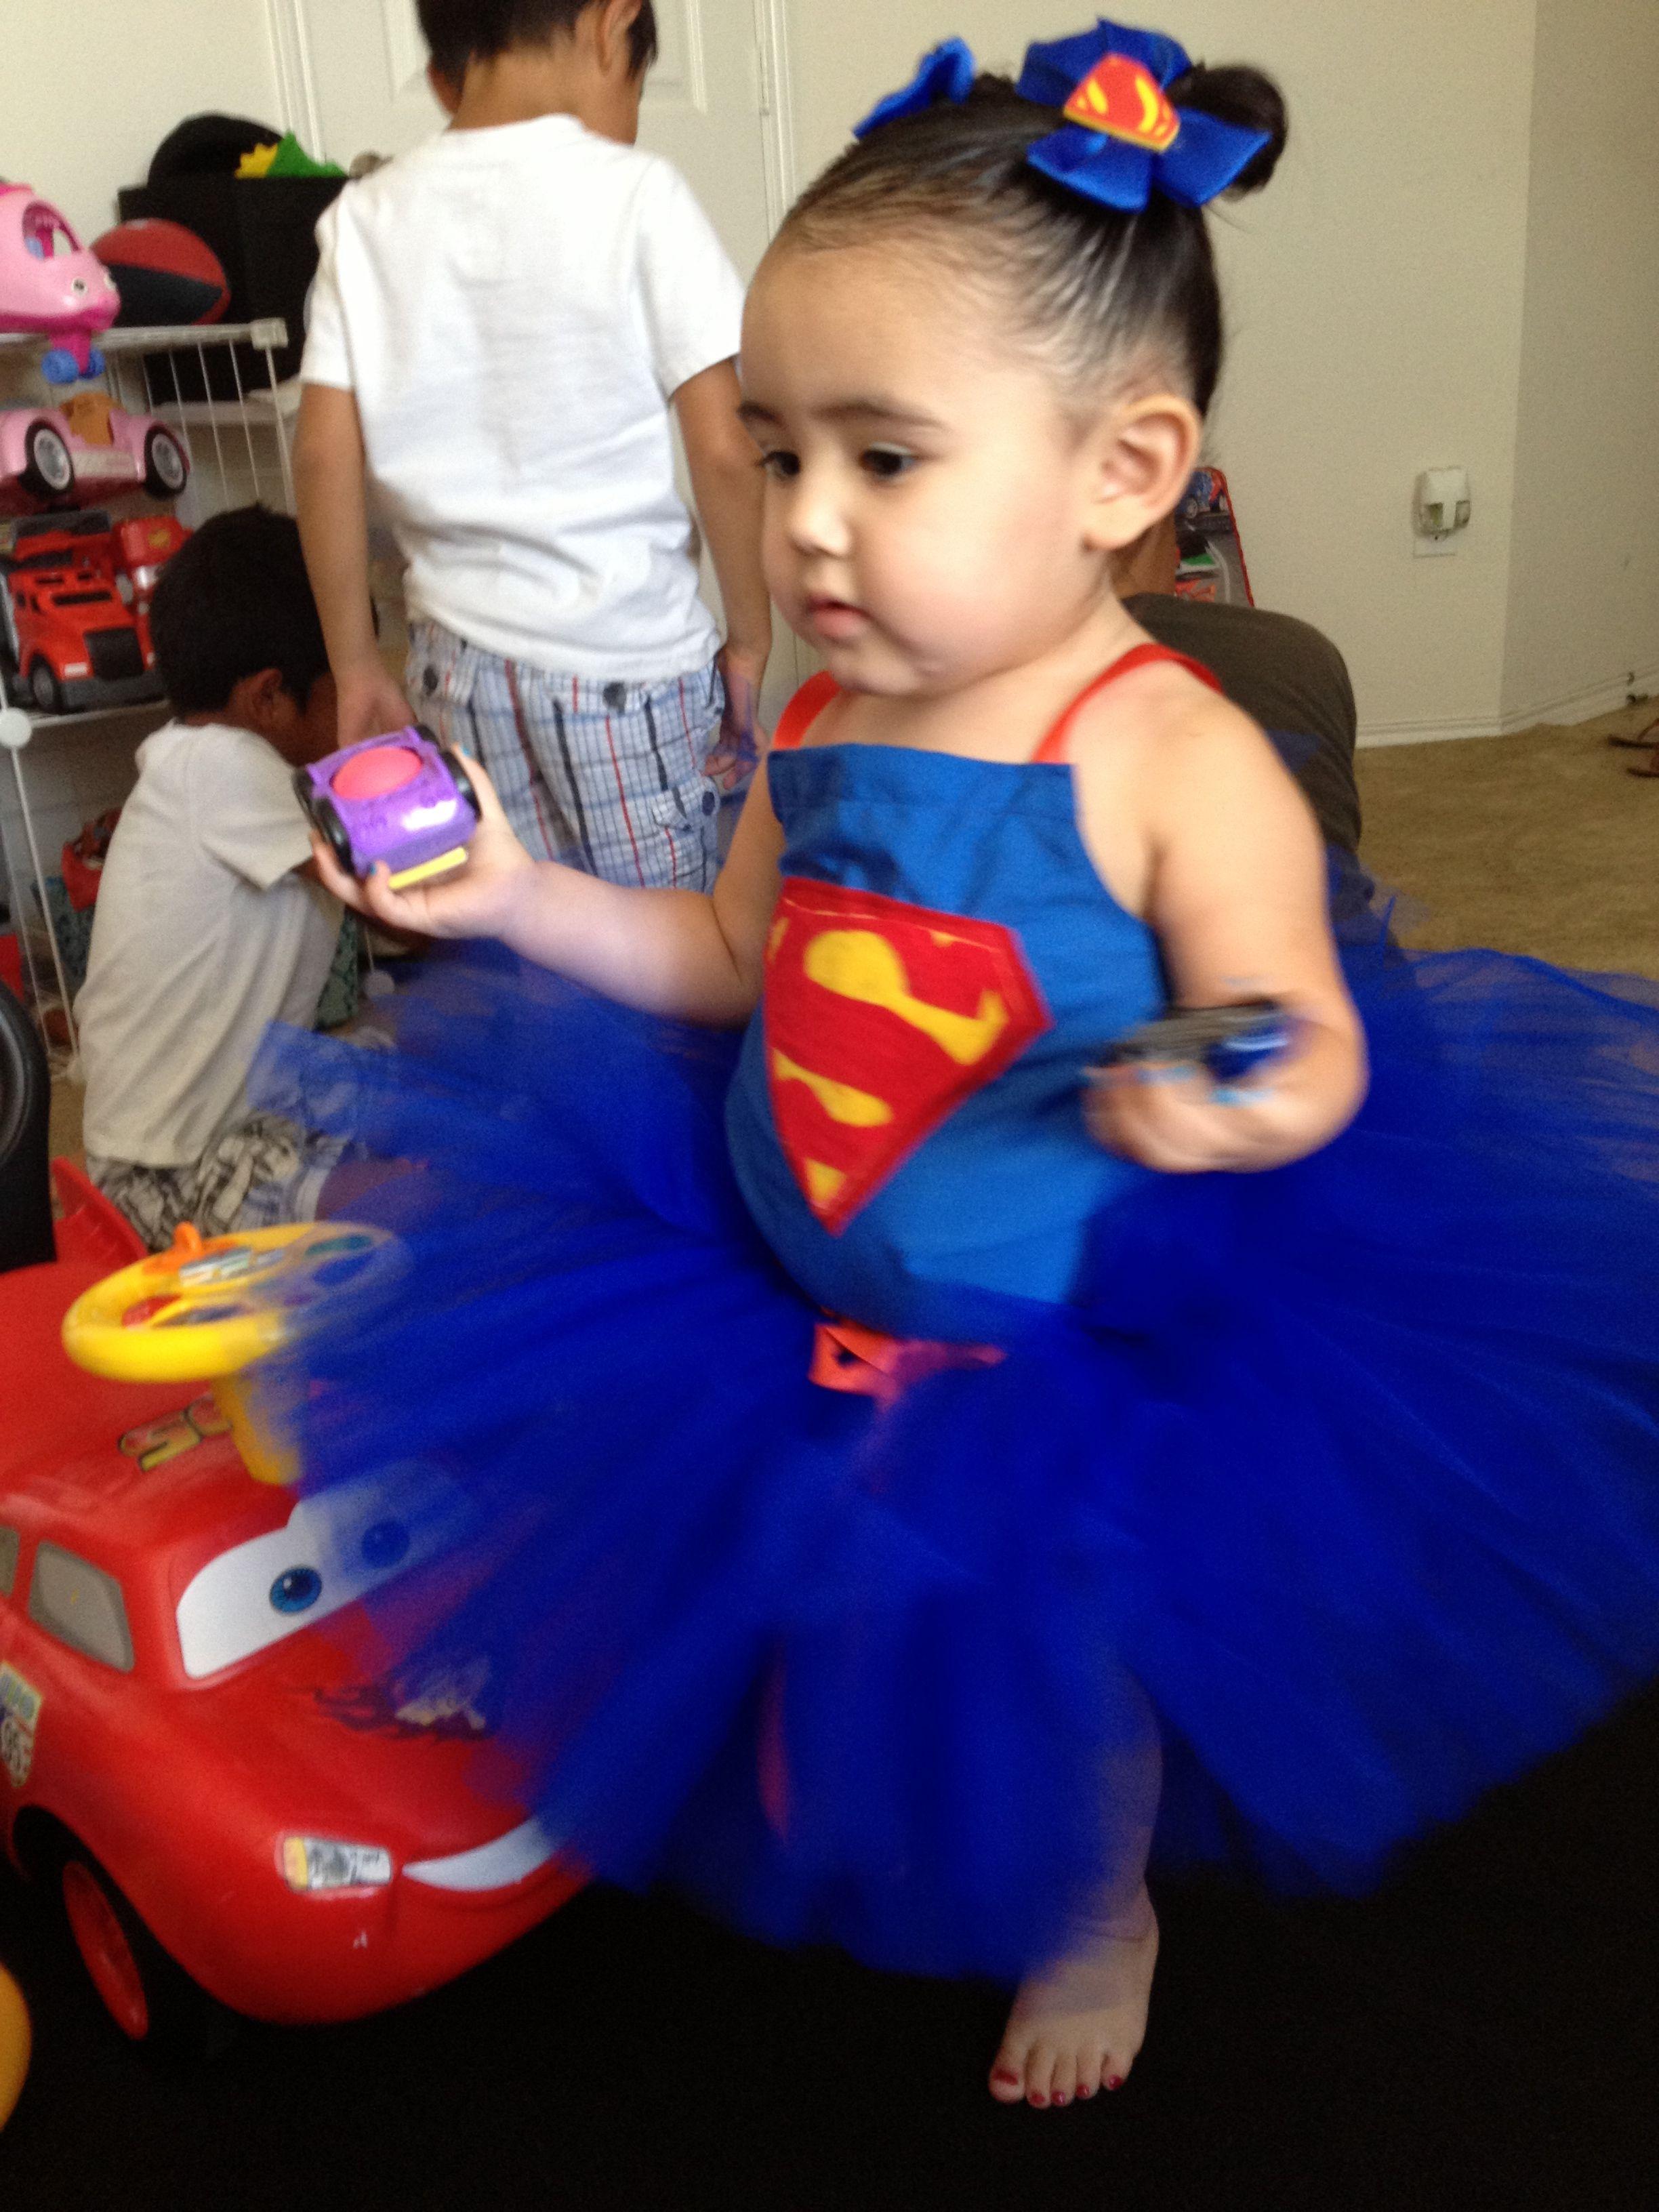 supergirl superman costume halloween costumes pinterest. Black Bedroom Furniture Sets. Home Design Ideas